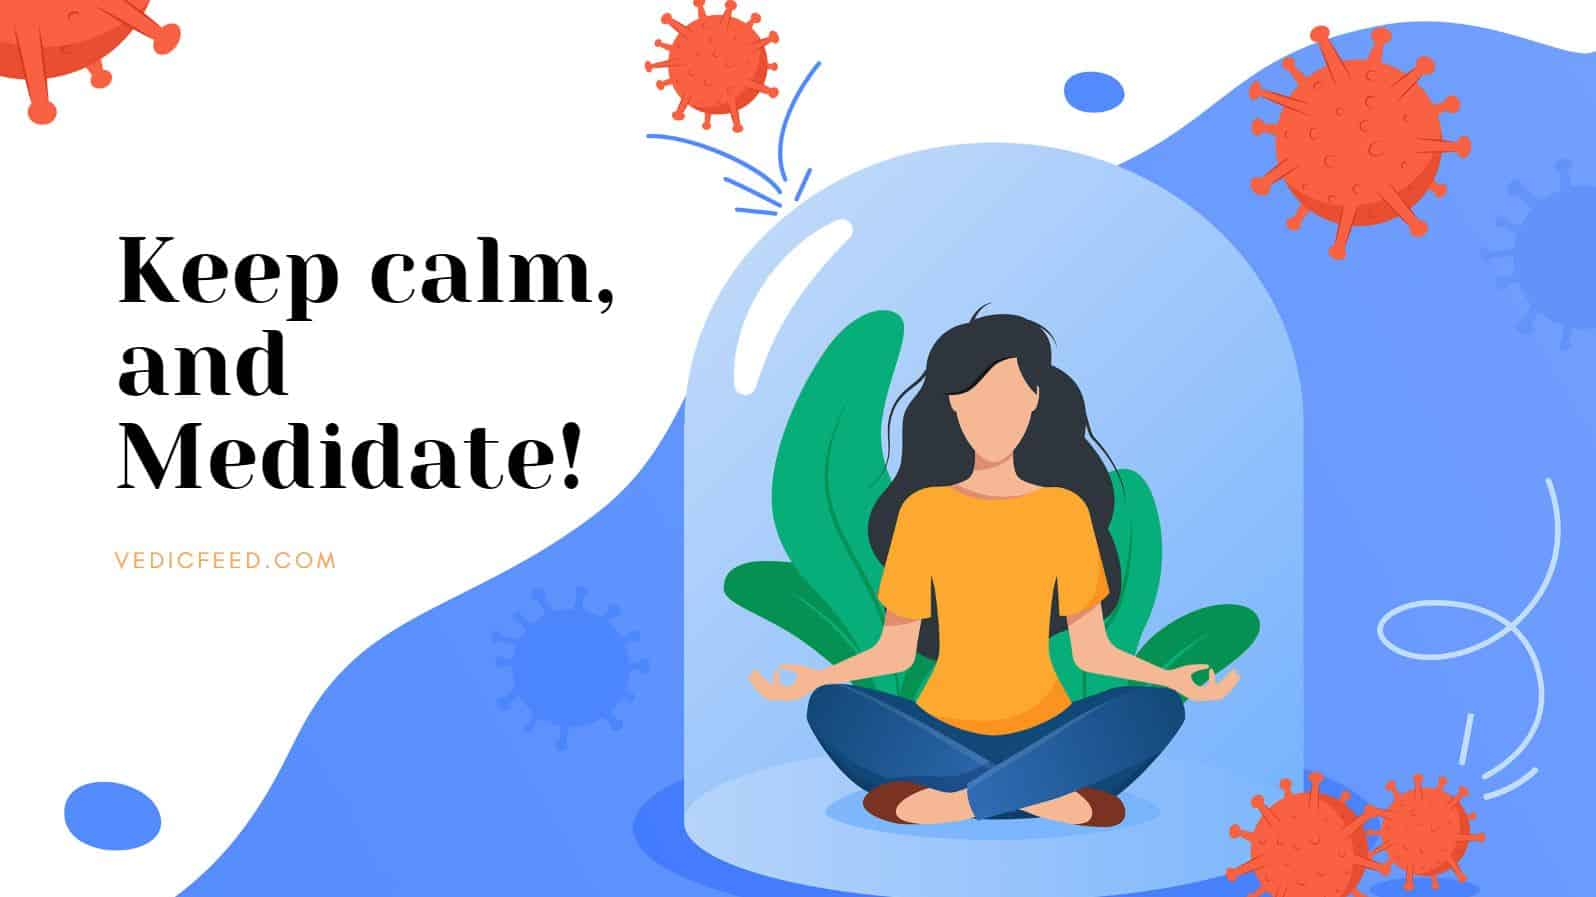 Keep calm and Meditate!